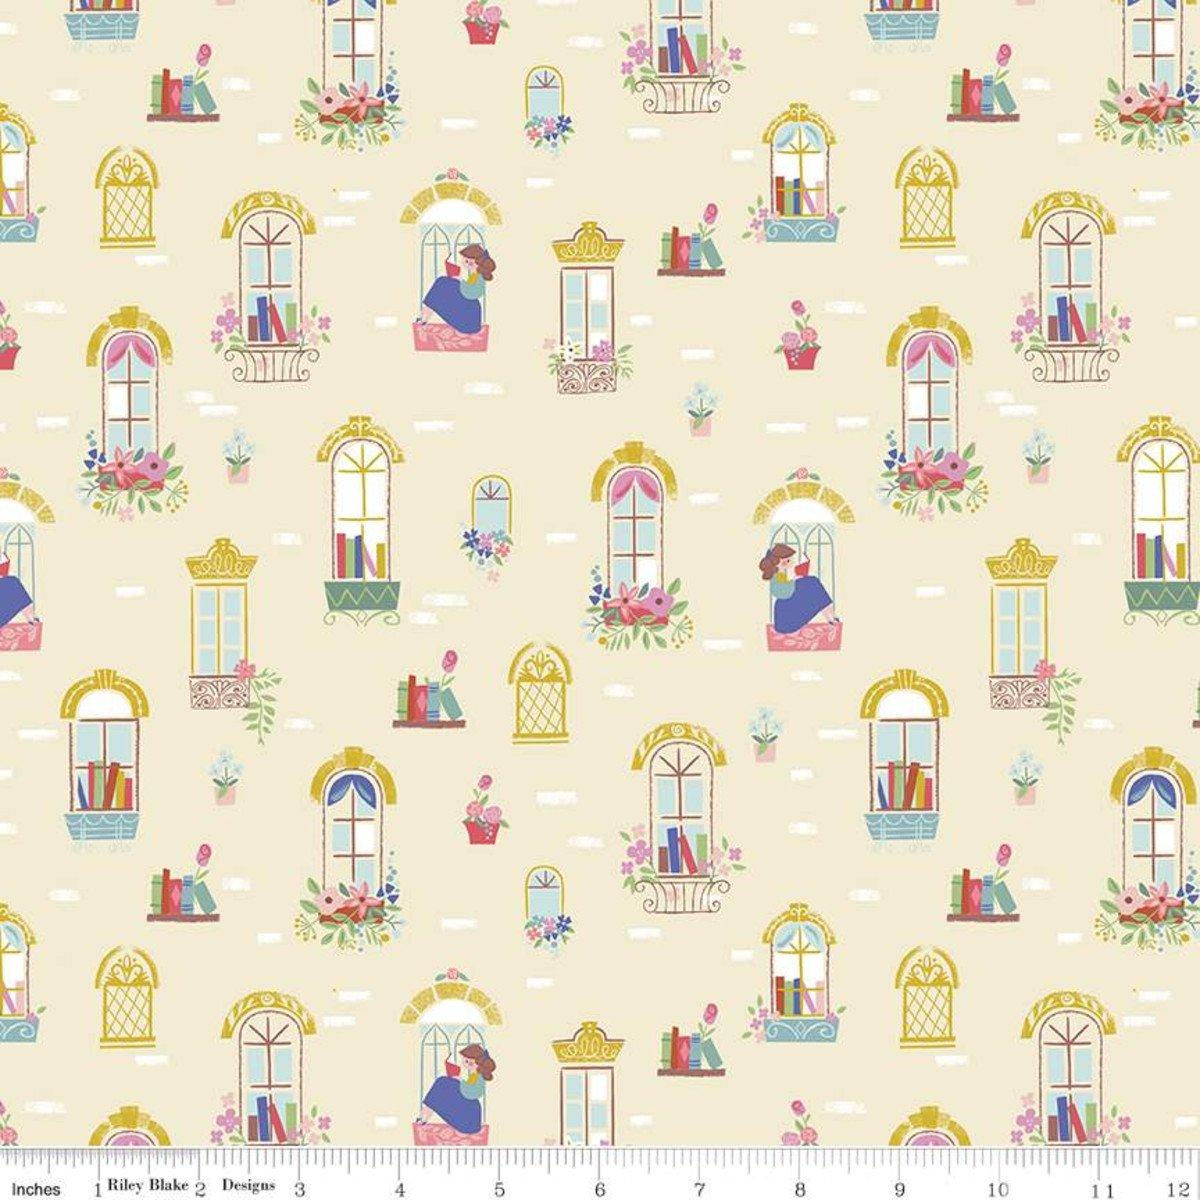 Beauty & the Beast Windows Cream Fabric by Riley Blake